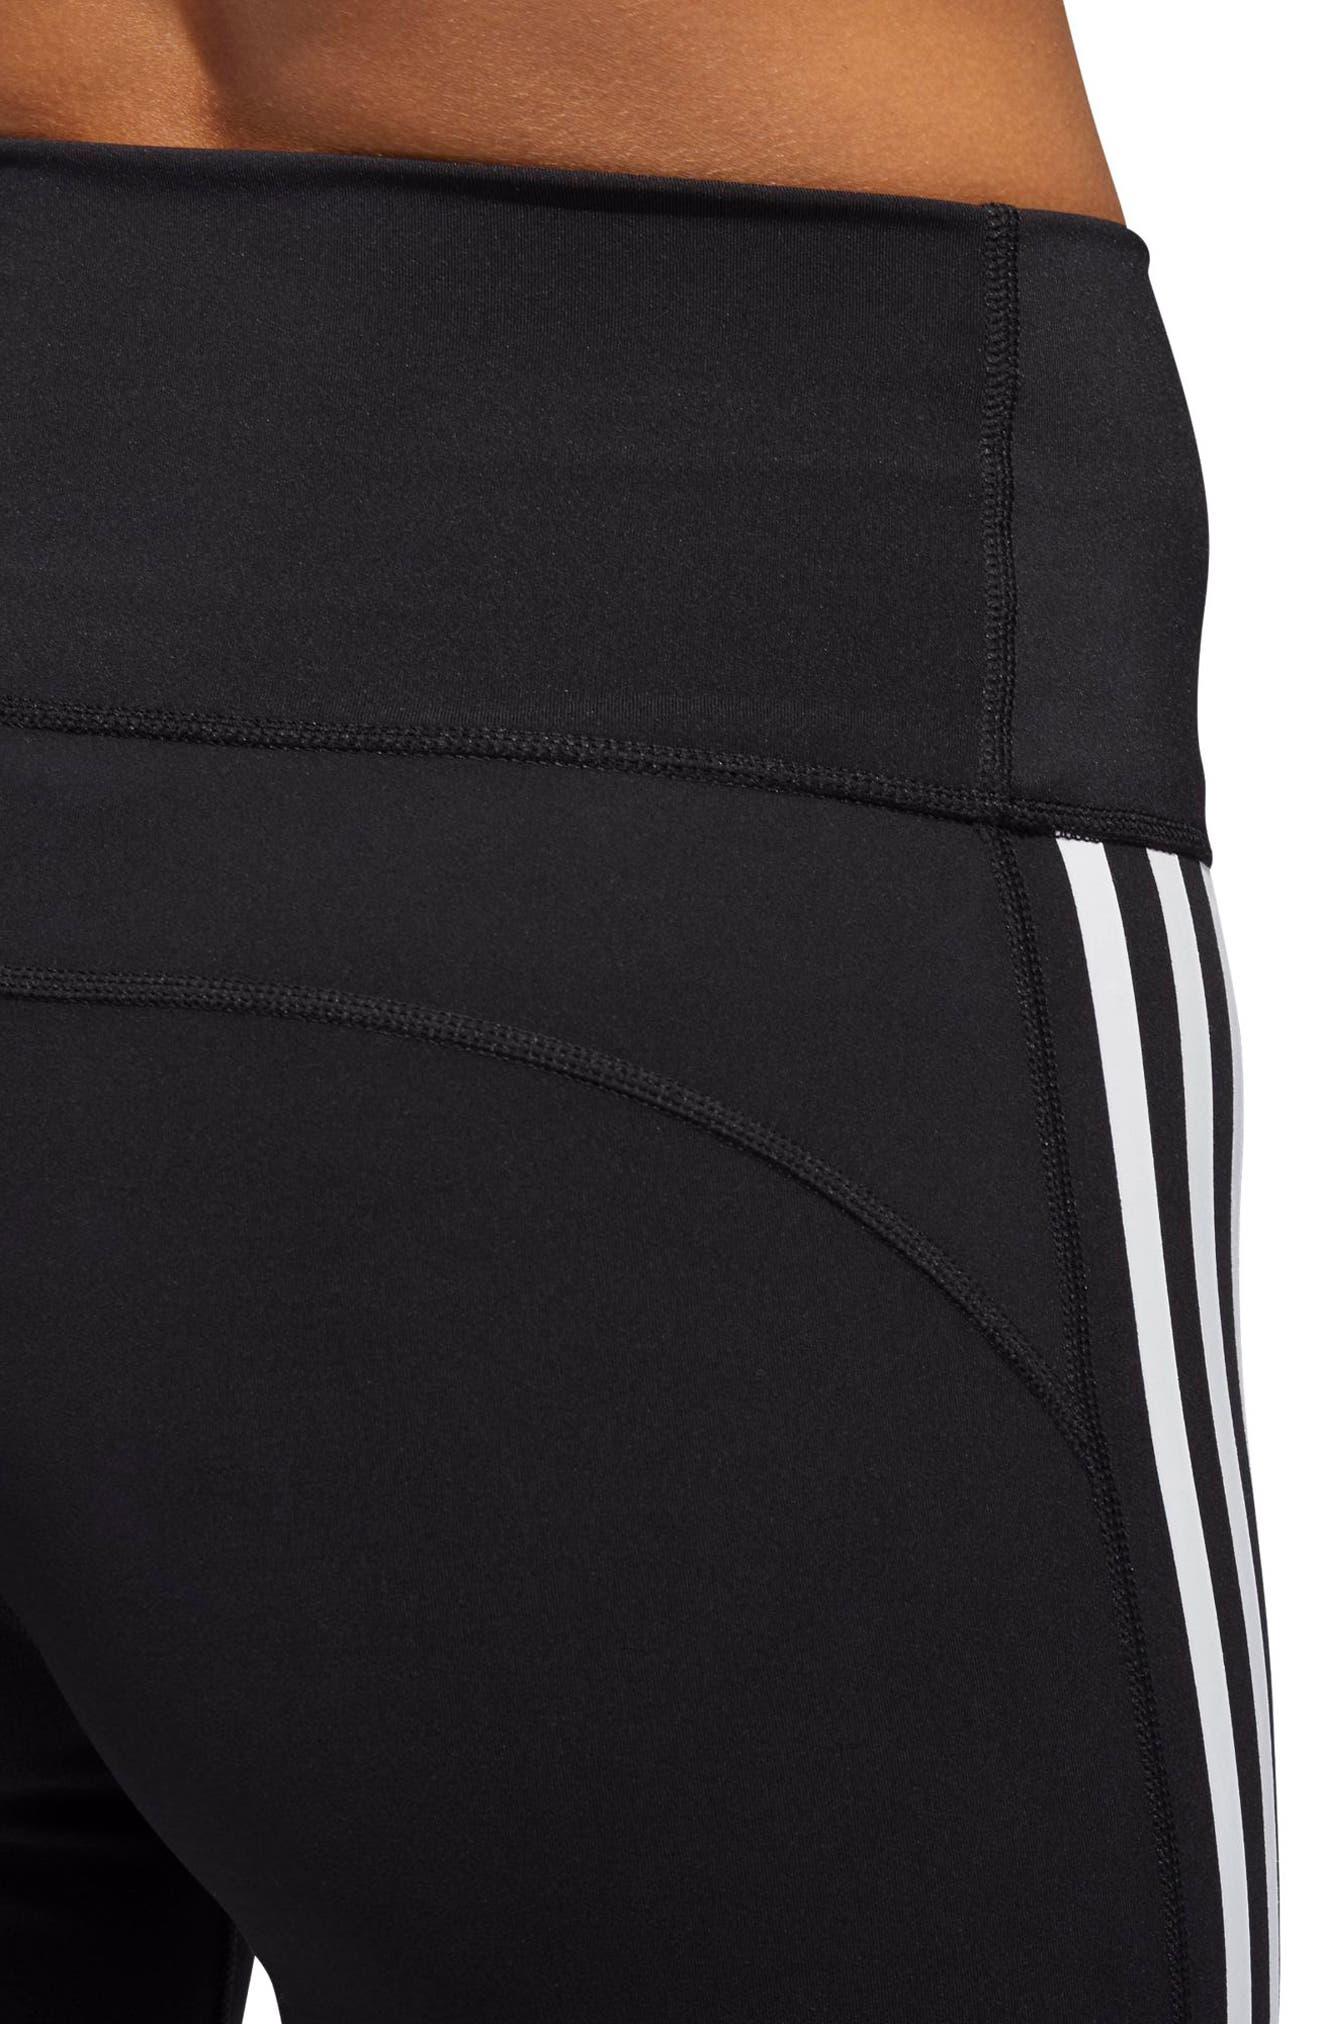 Believe This 3-Stripes High Waist Ankle Leggings,                             Alternate thumbnail 8, color,                             BLACK/ WHITE